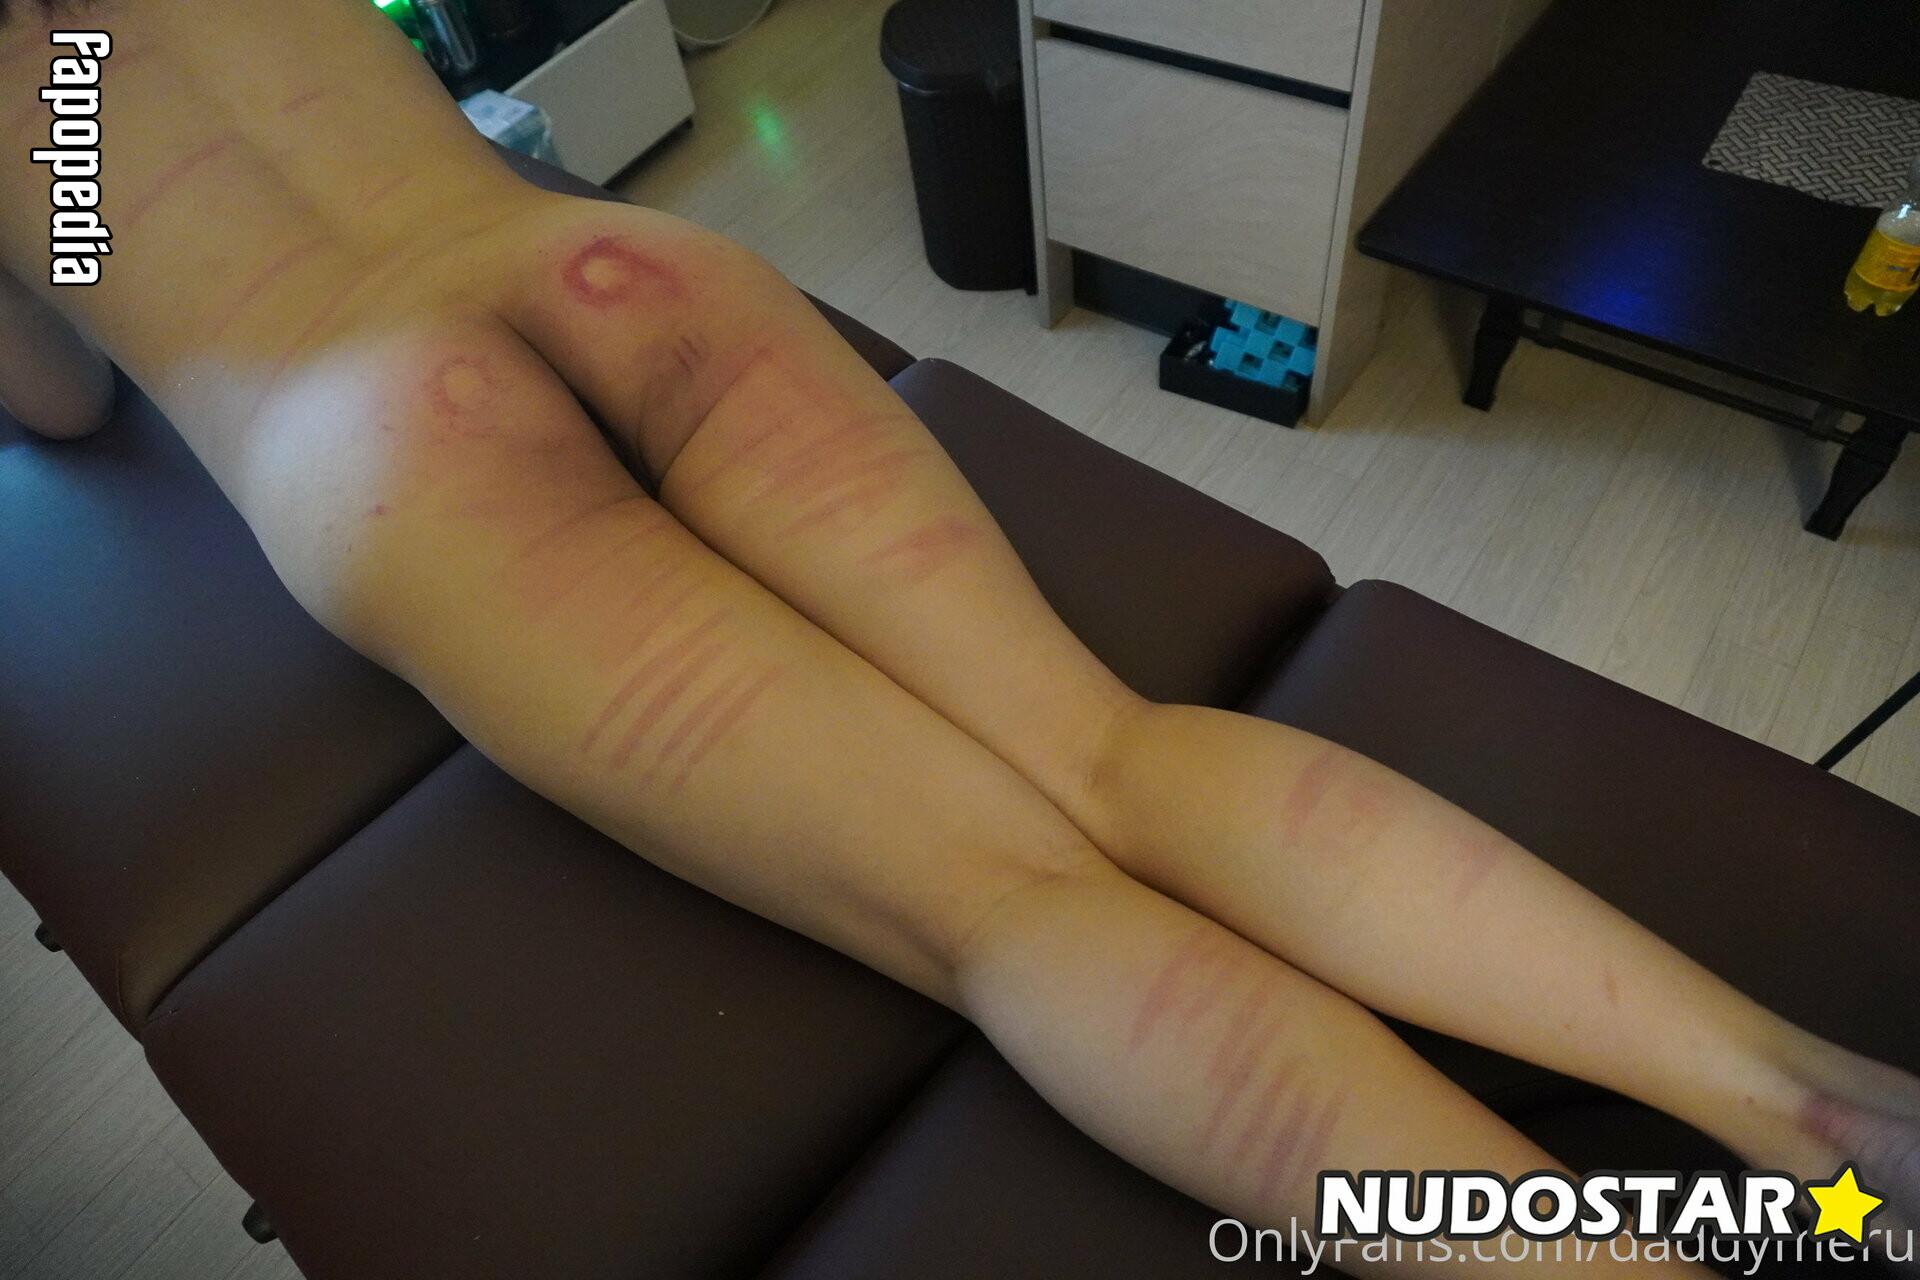 Daddymeru Nude OnlyFans Leaks